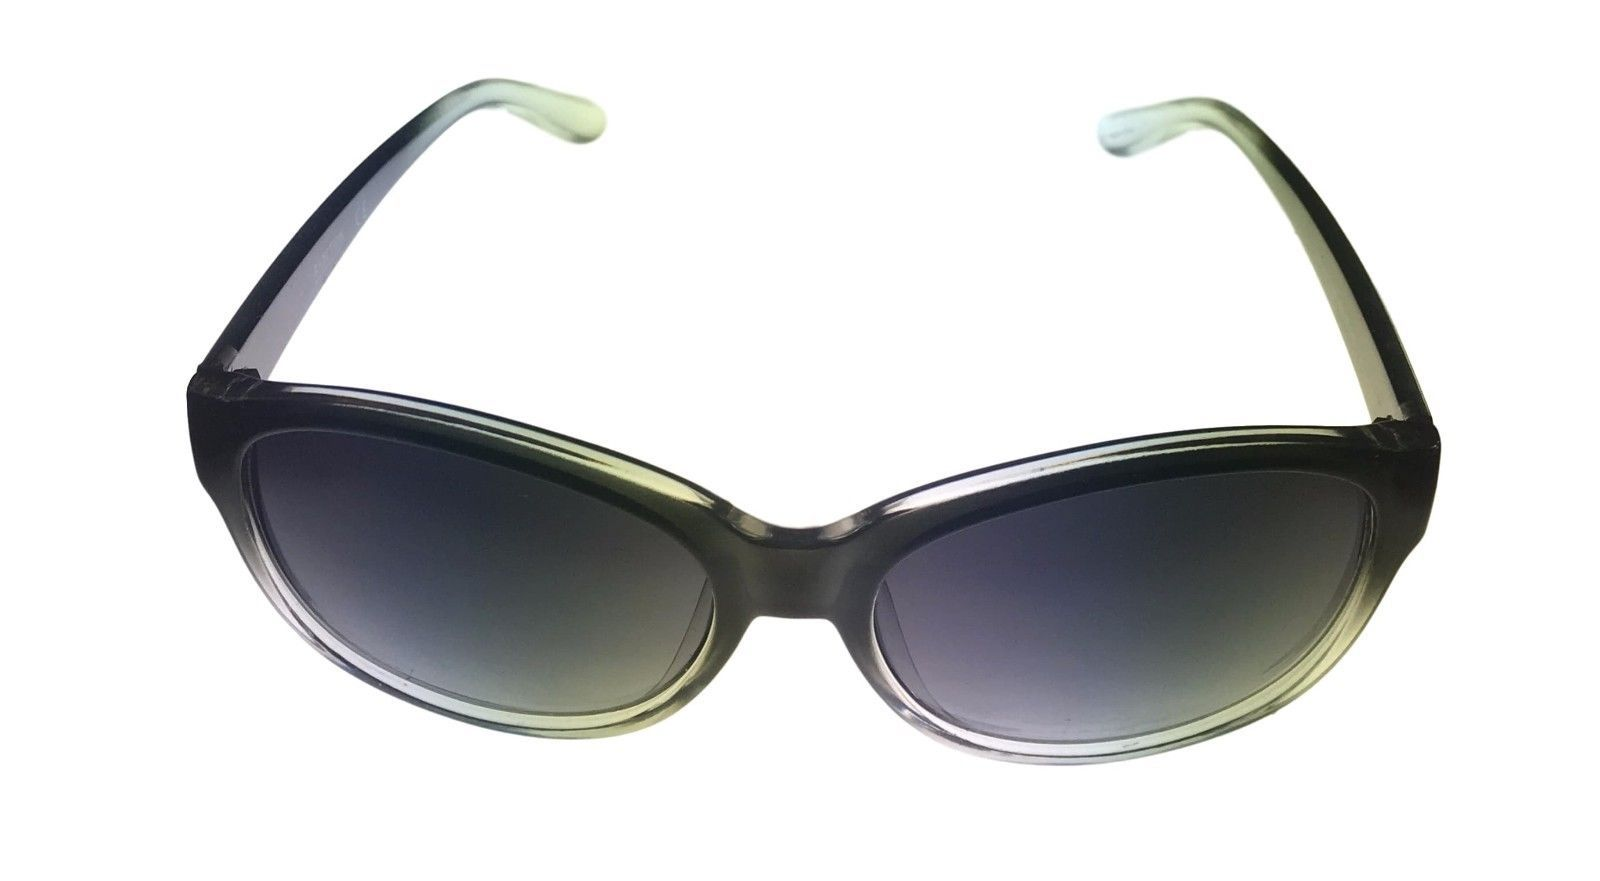 Kenneth Cole Reaction Mens Plastic Sunglass Black Fade, Gradient KC1290 5B image 2